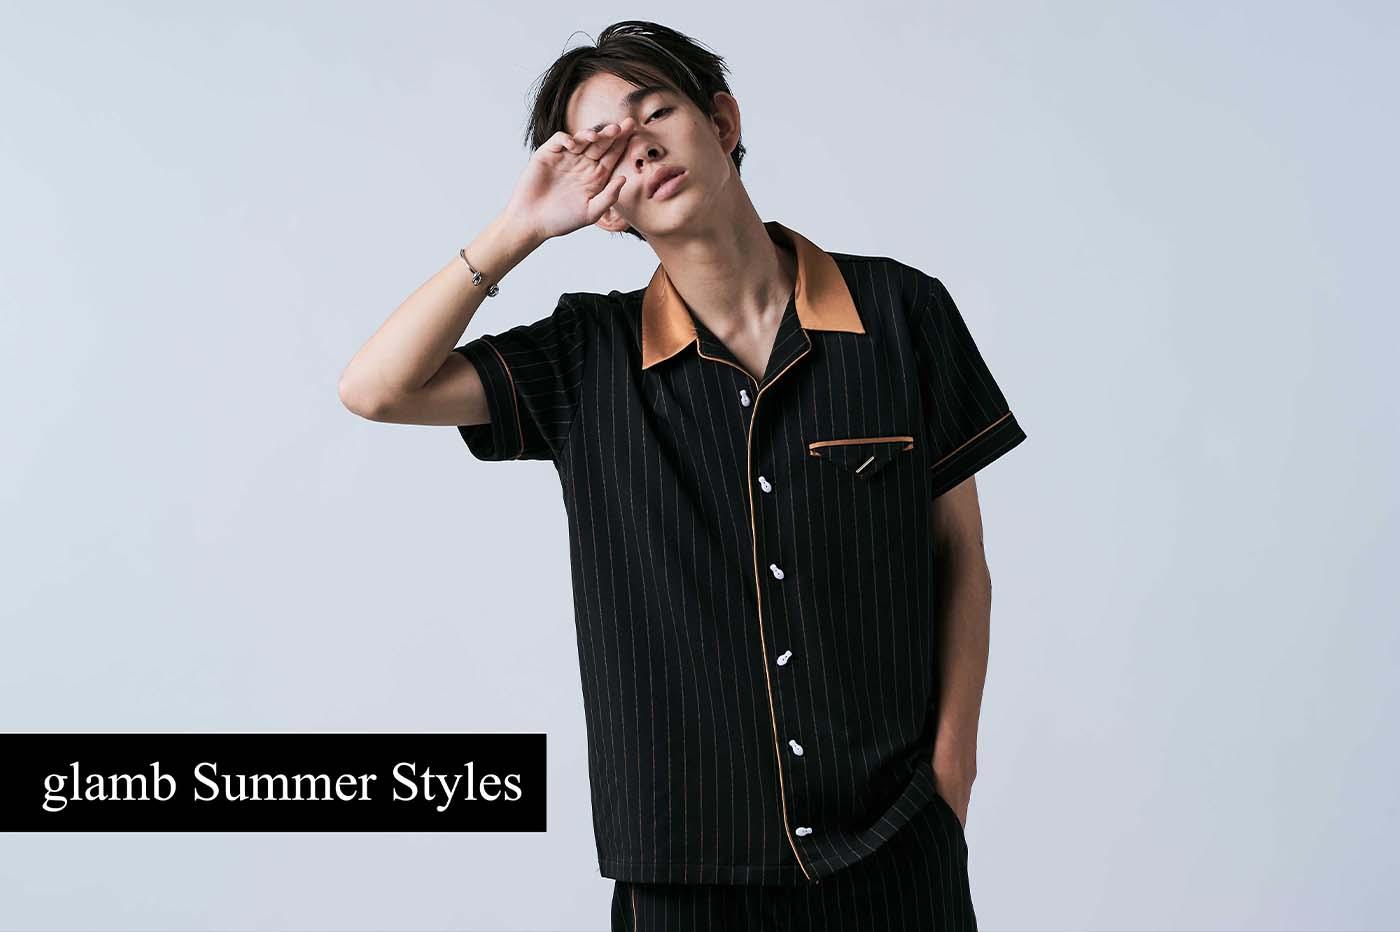 glamb Summer Styles-Ota Tajima-